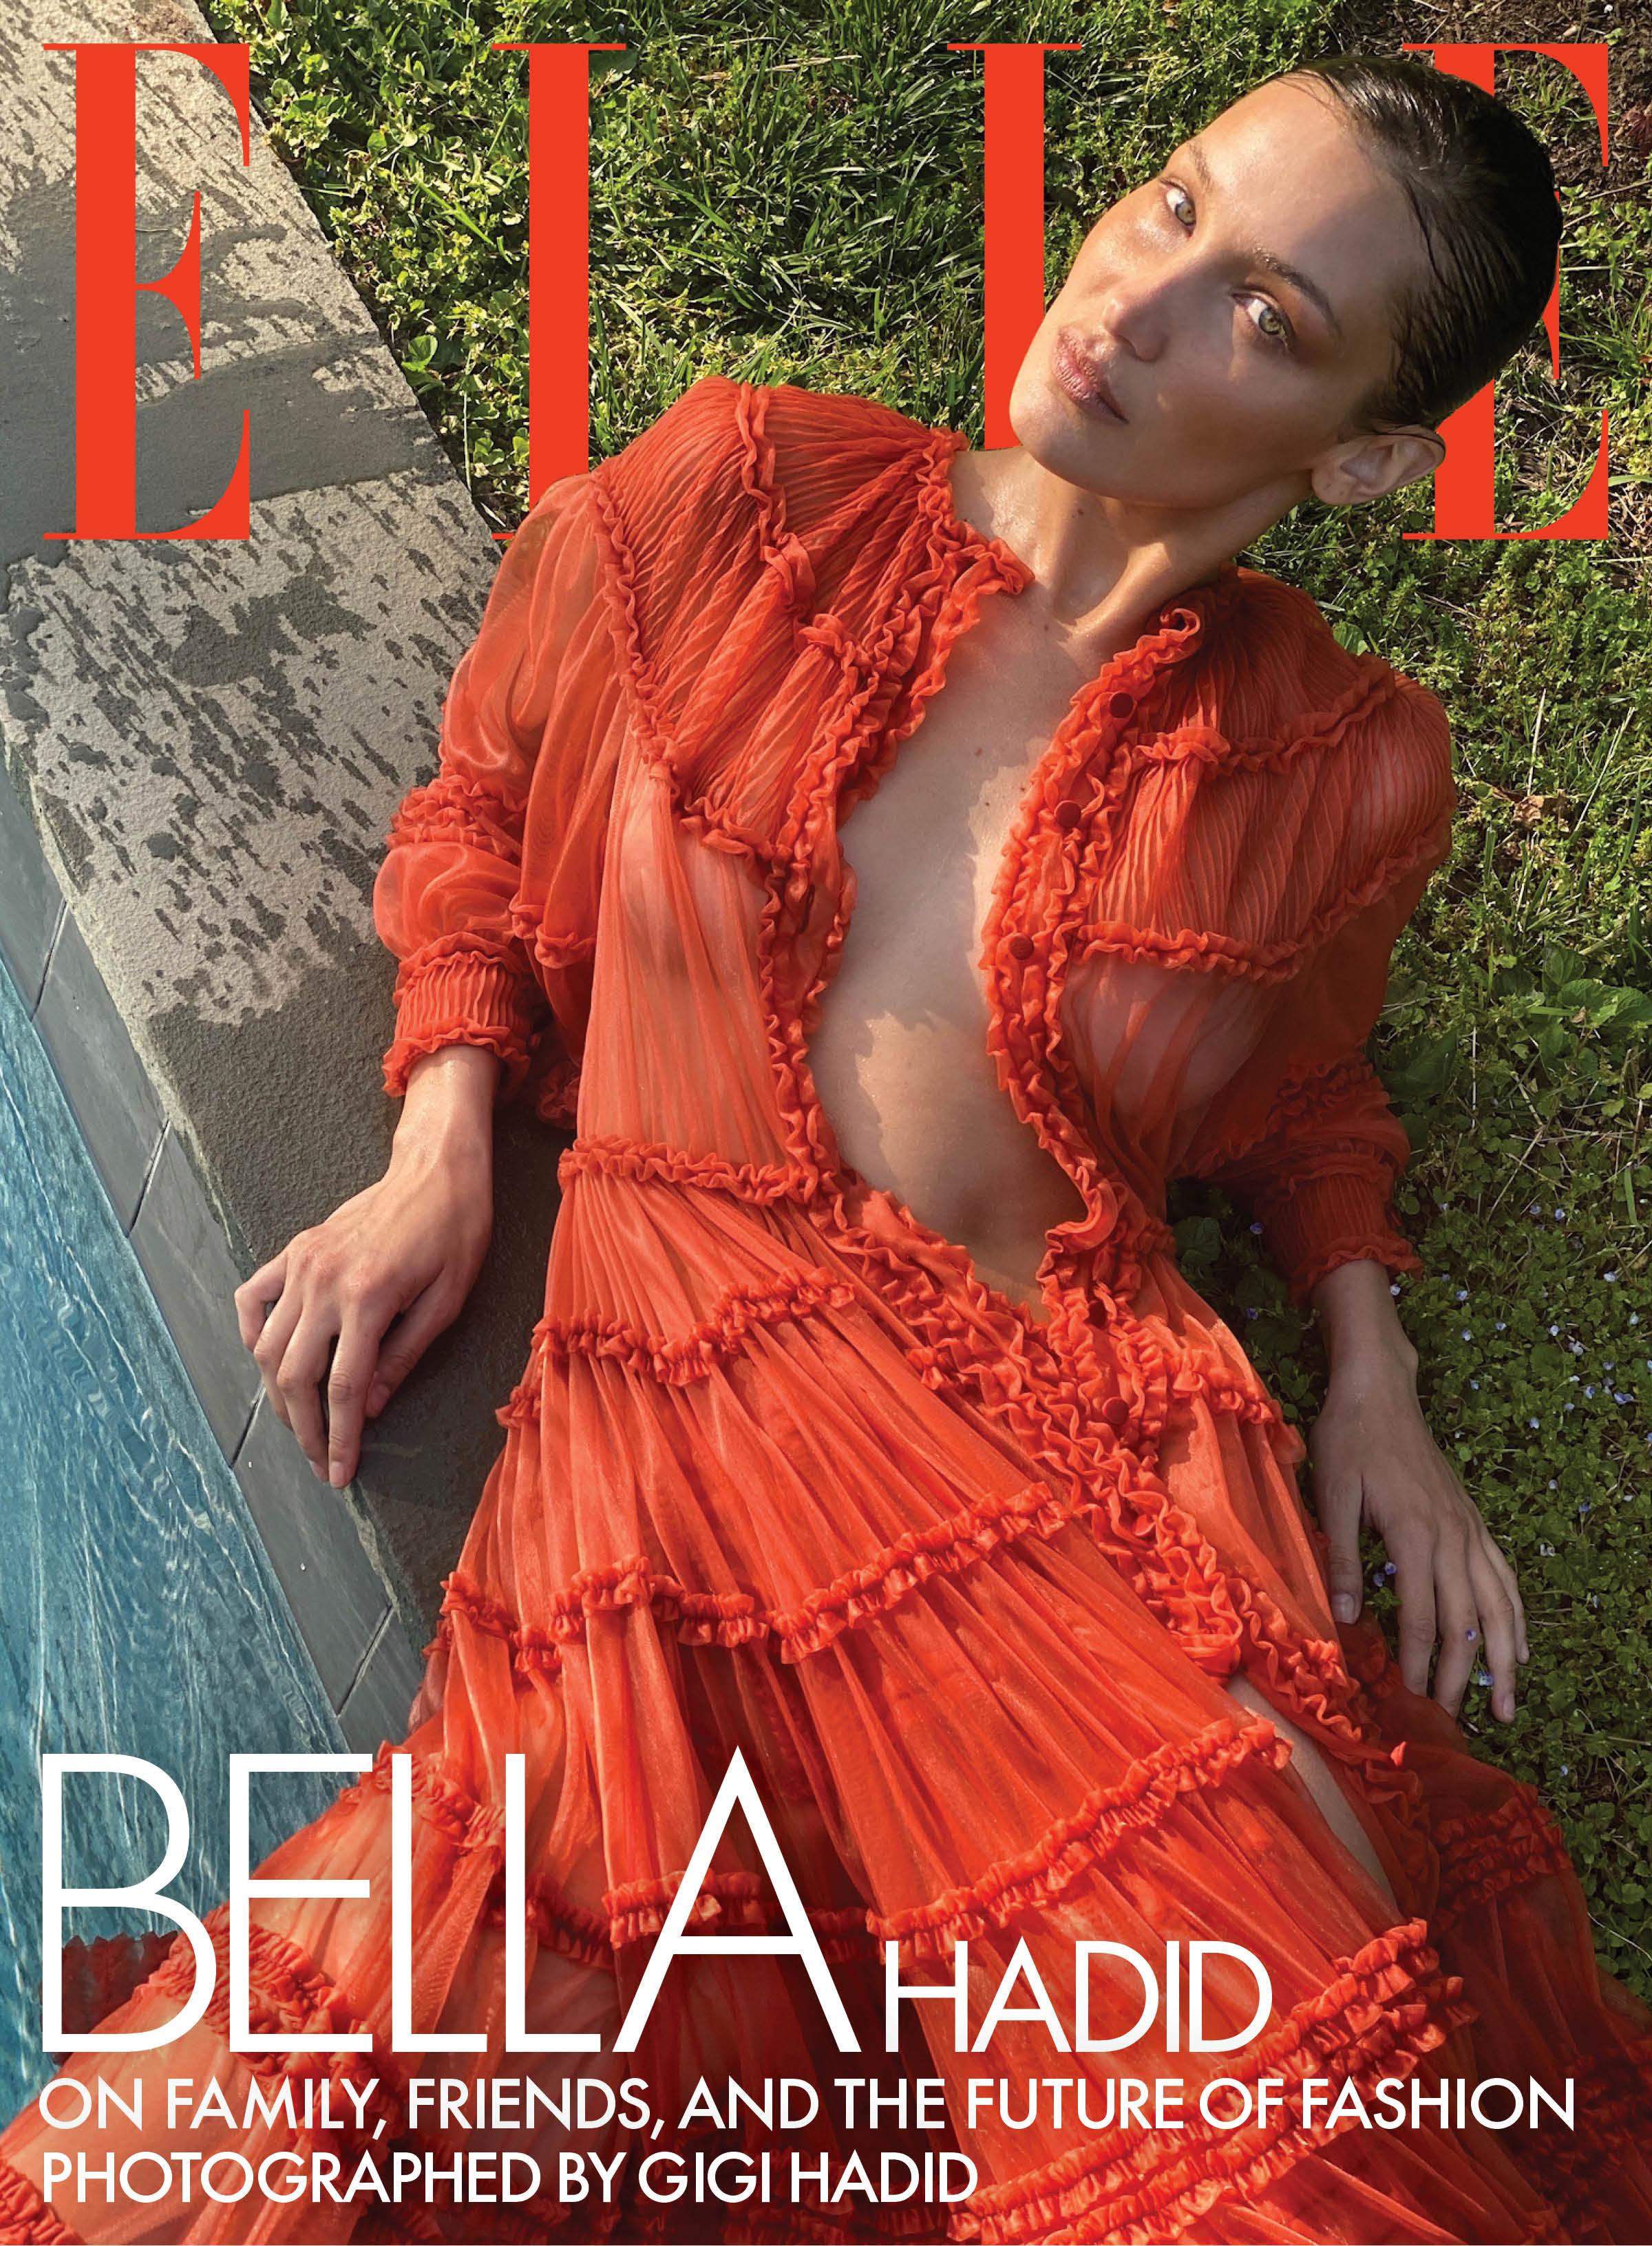 Bella Hadid calls for racial inclusivity in fashion industry, sister Gigi Hadid shoots cover photo